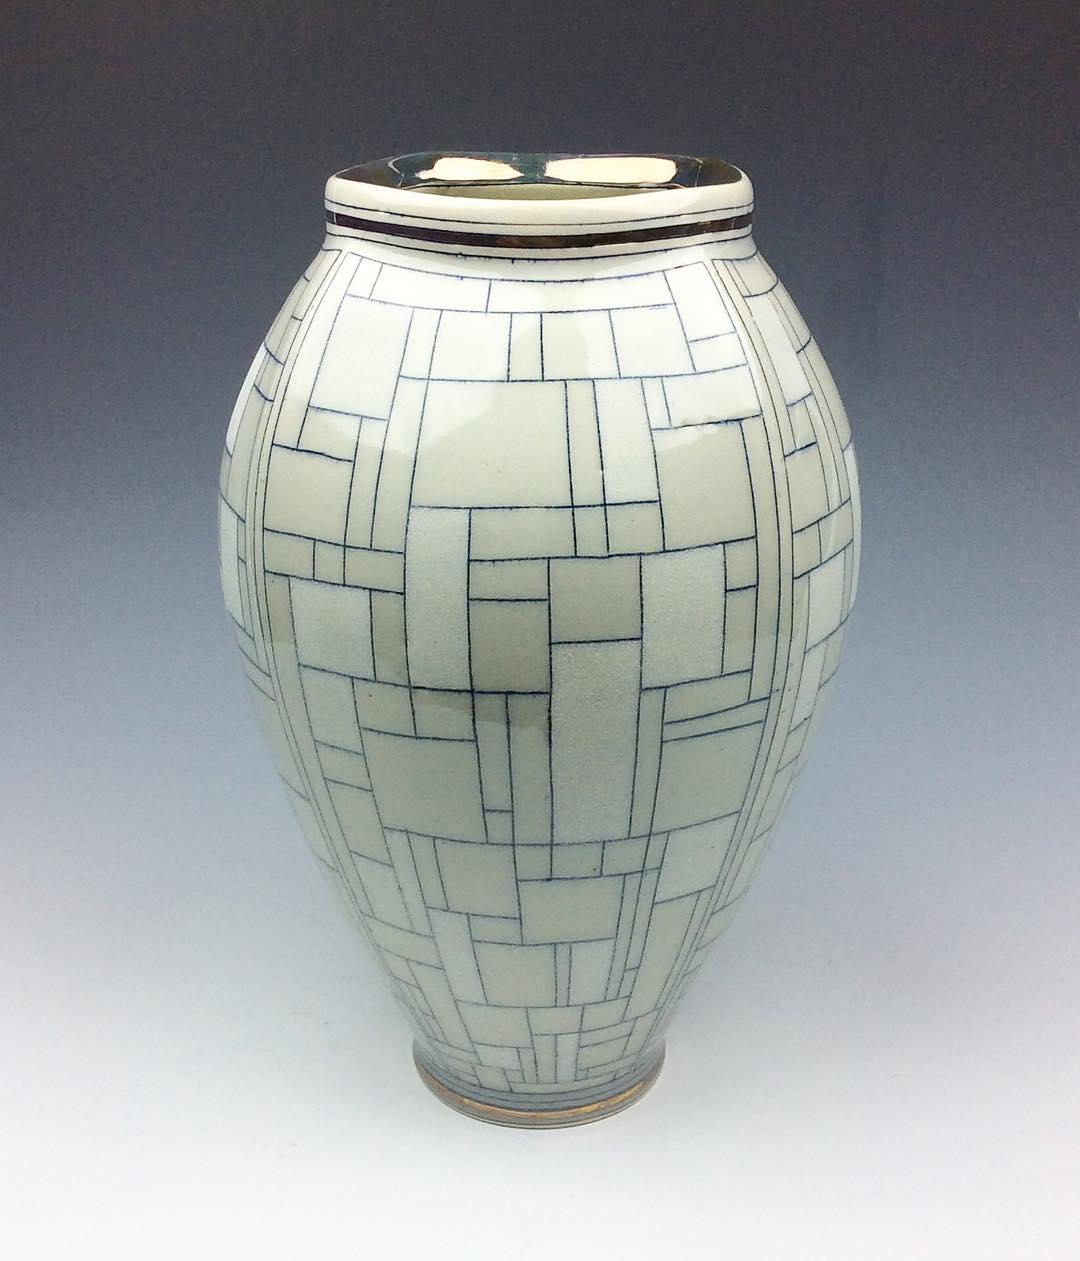 Contemplative Architecture, Post-Modern Vase